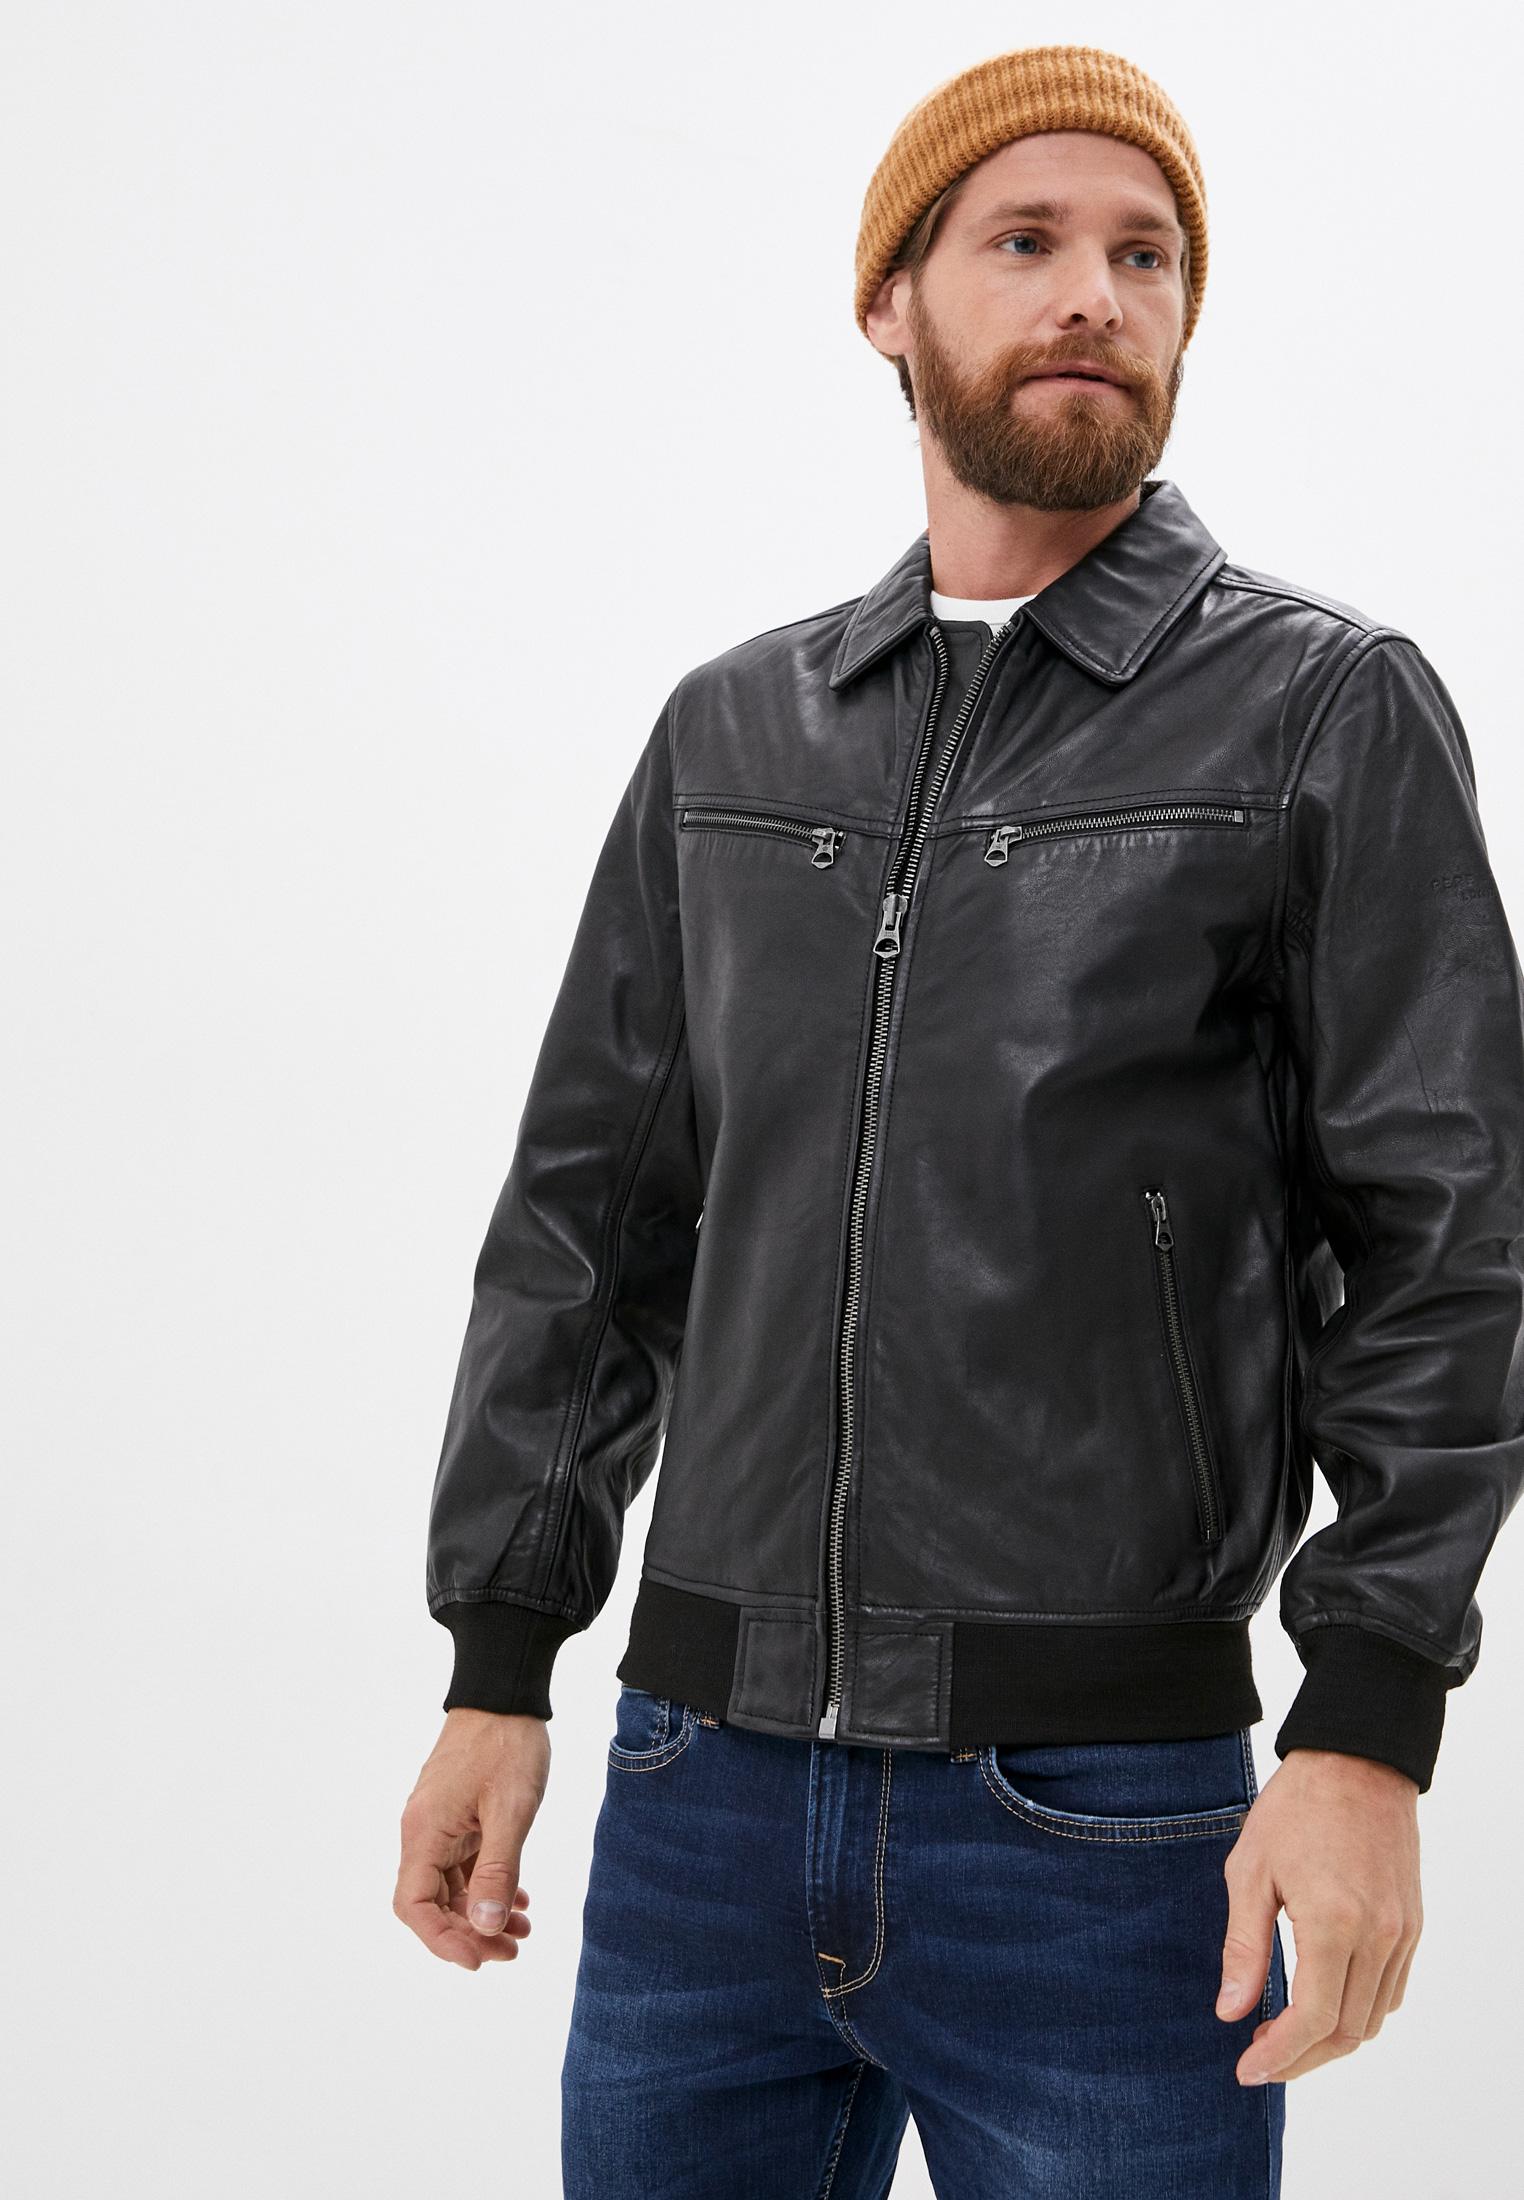 Кожаная куртка Pepe Jeans (Пепе Джинс) PM402283